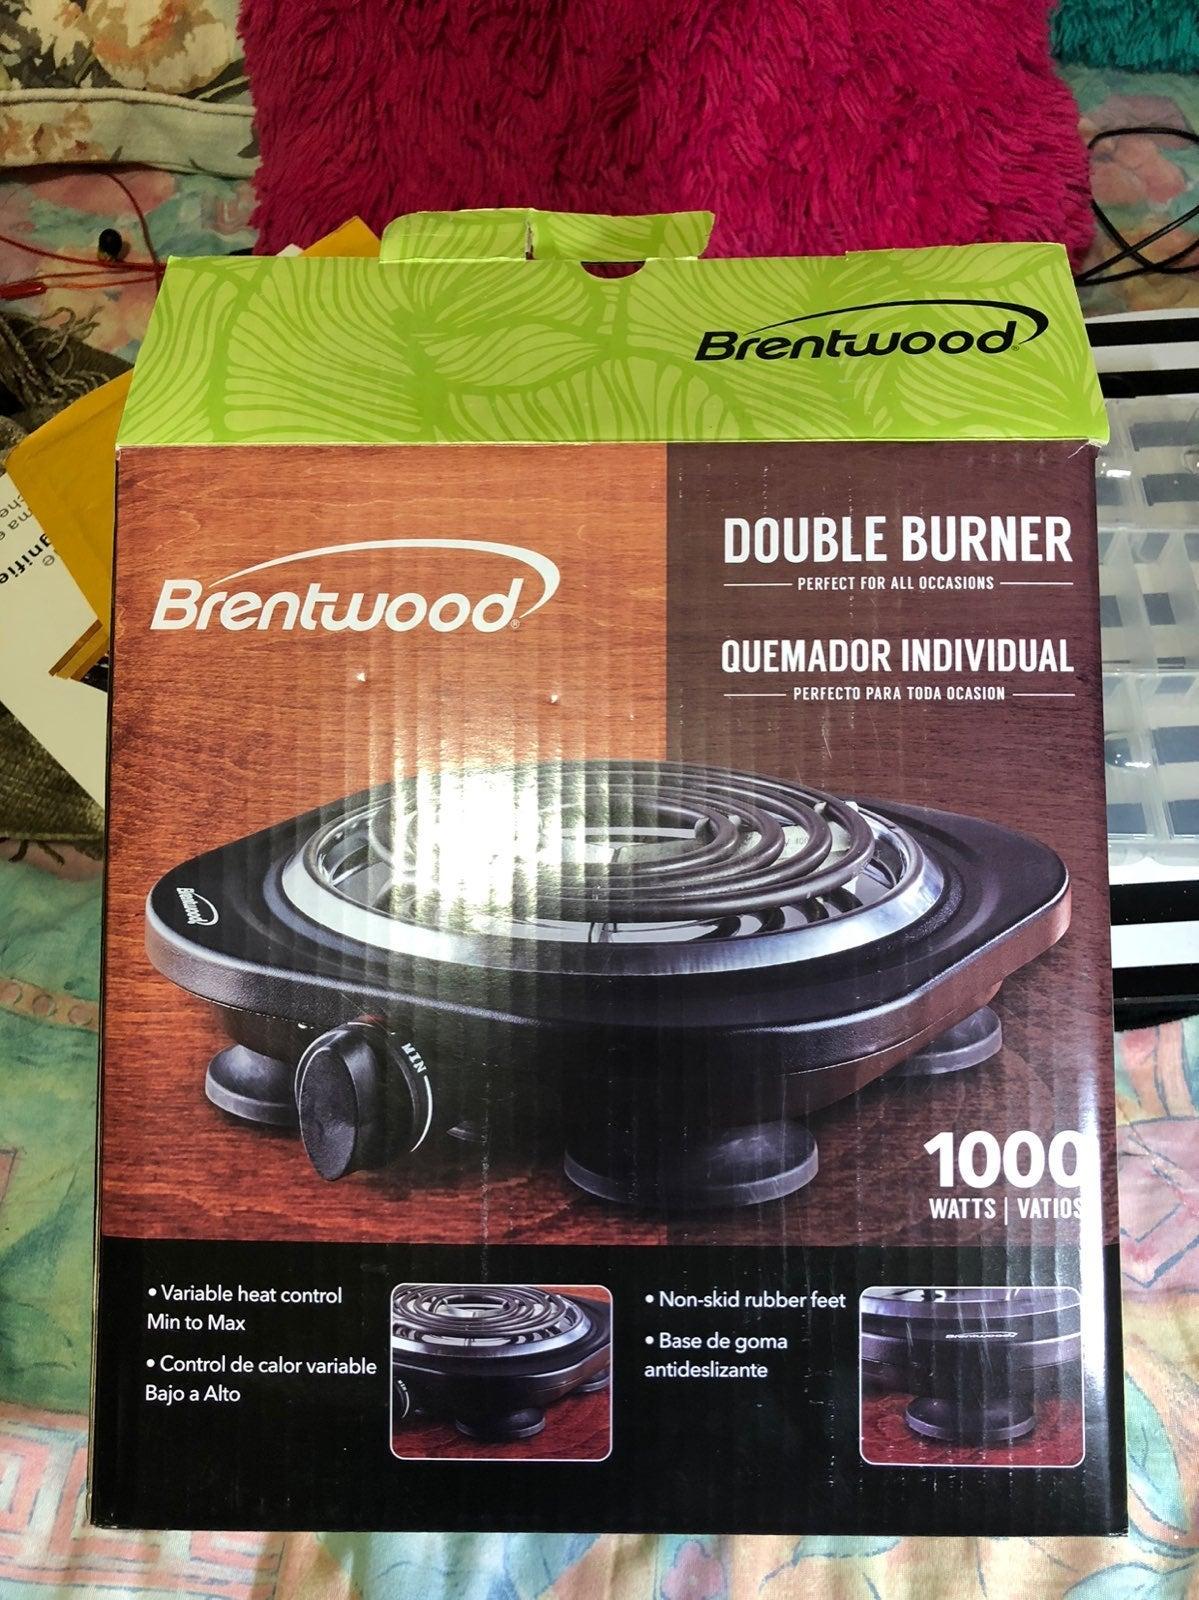 Double Burner- Brentwood Brand